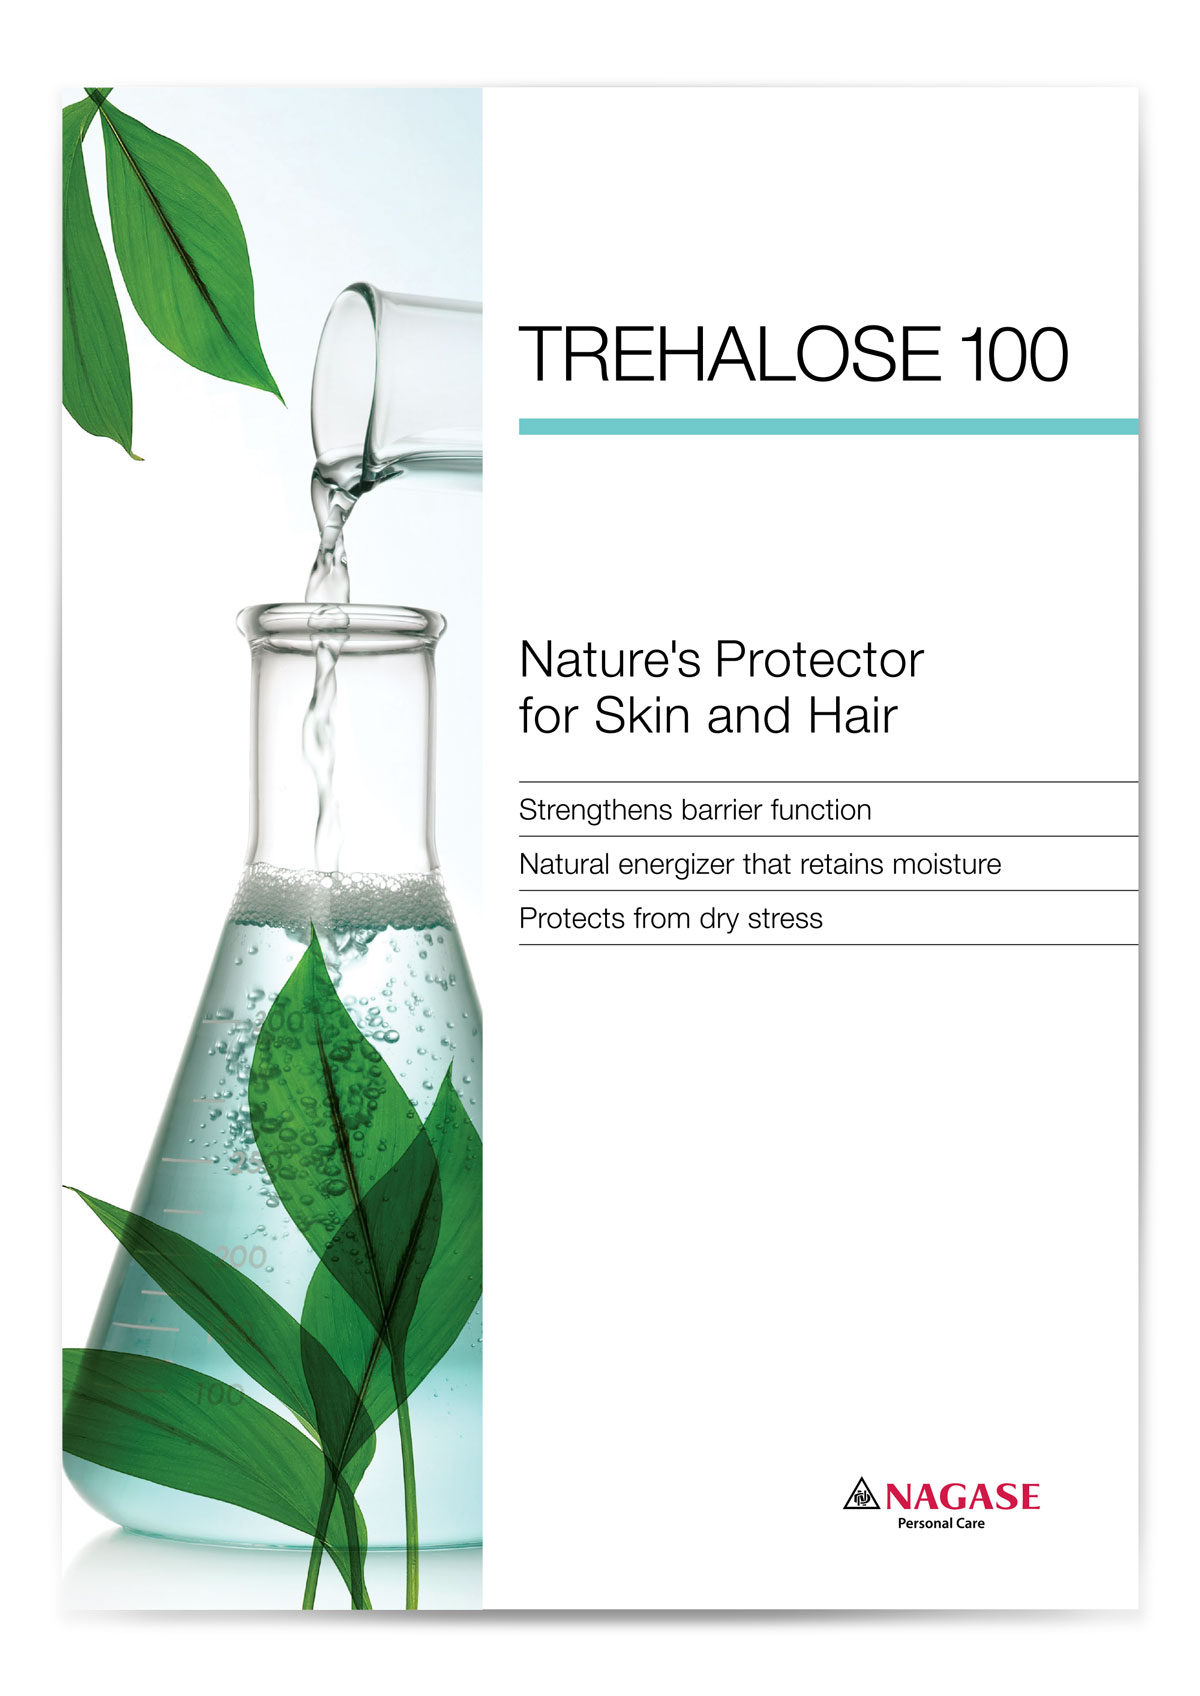 Nagase Brochure Trehalose